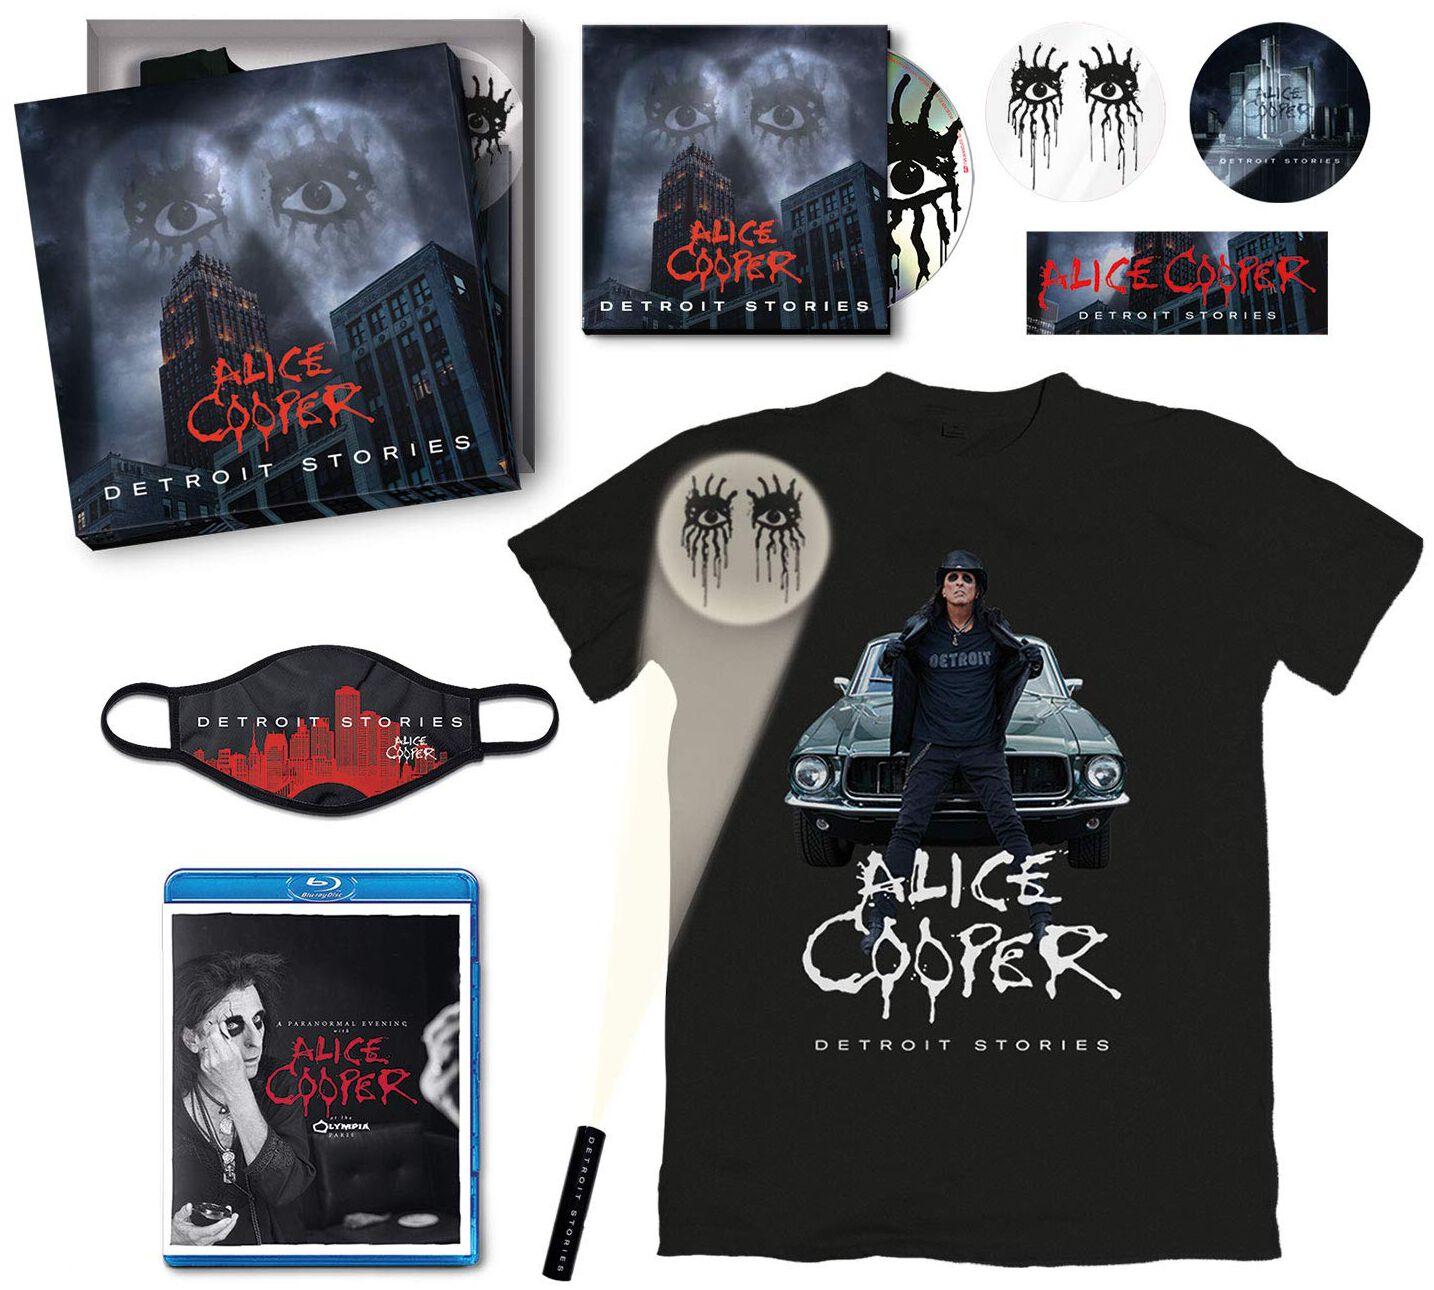 Alice Cooper  Detroit stories  CD & Blu-ray  Standard